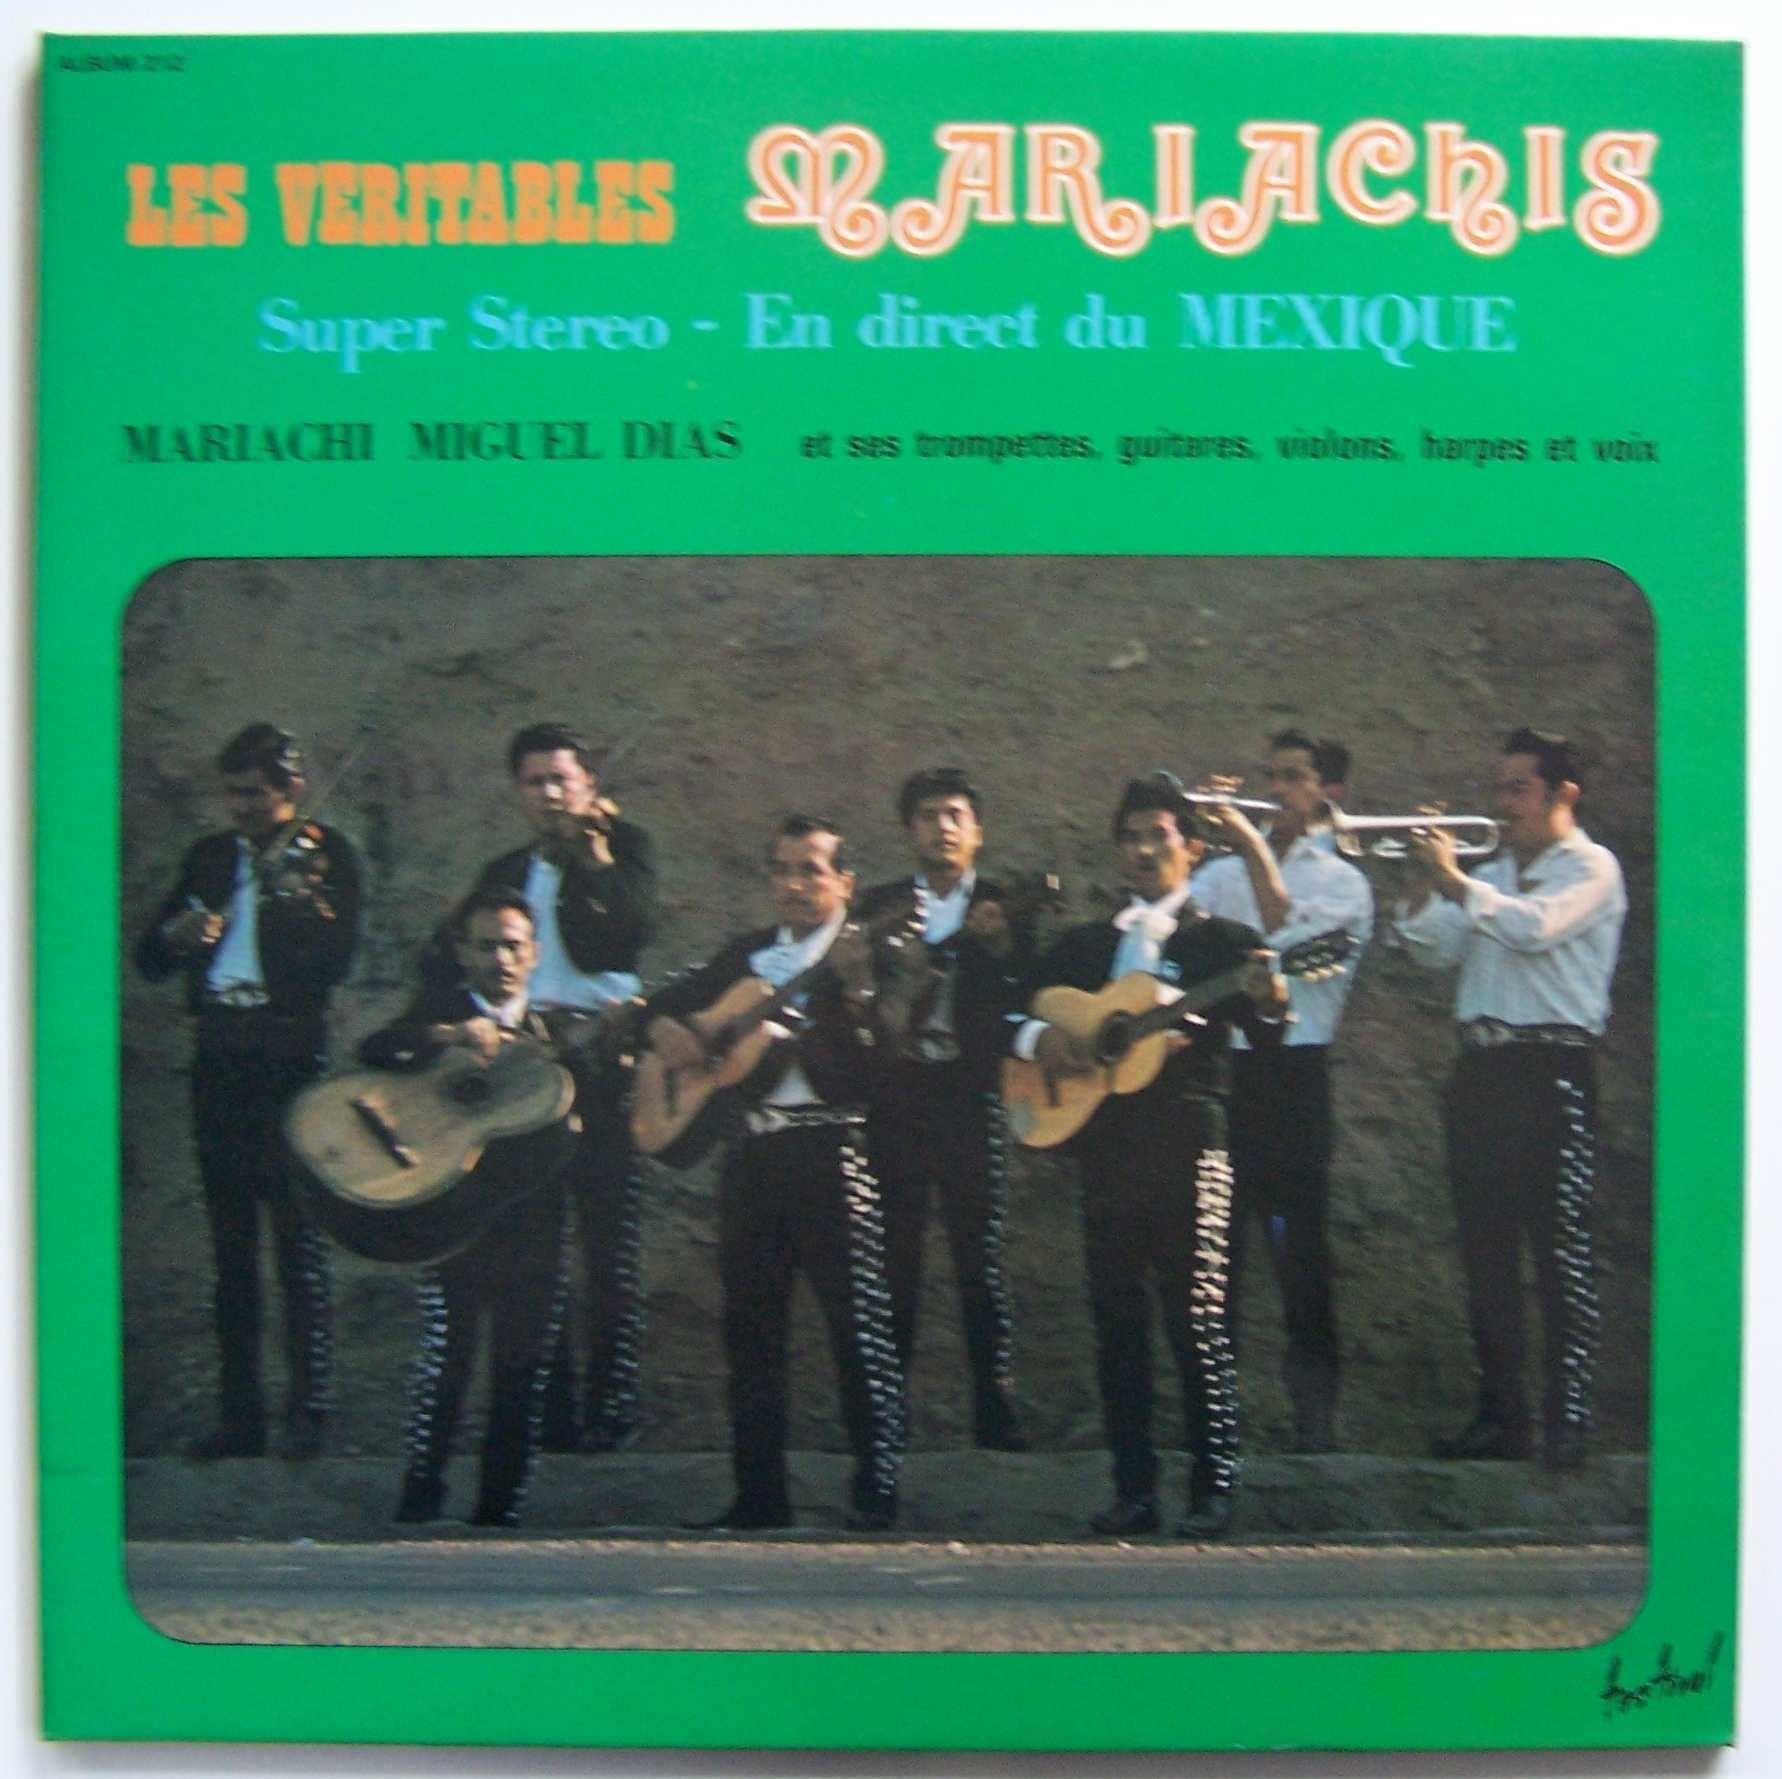 Mariachi Miguel Dias - Les Veritables Mariachi